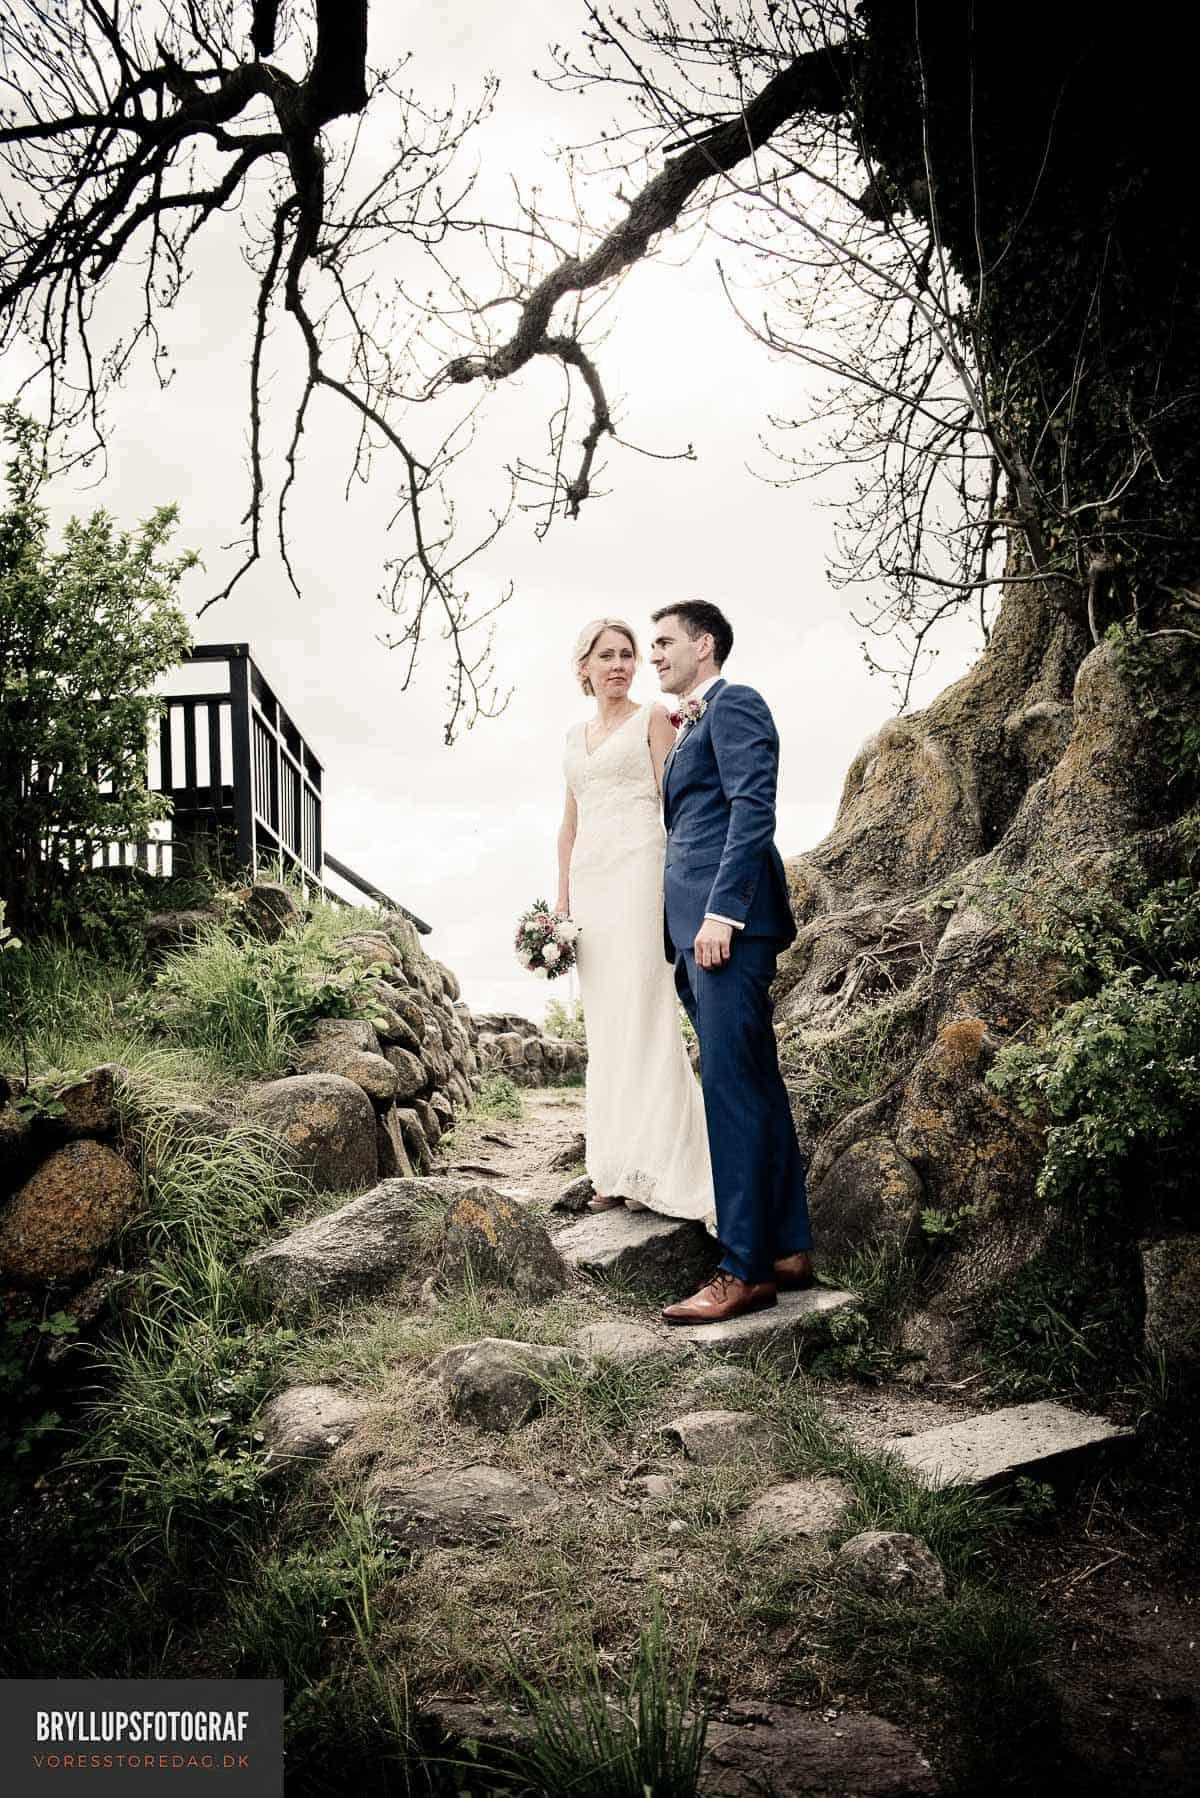 Bryllupsfotograf Jomfrubakken